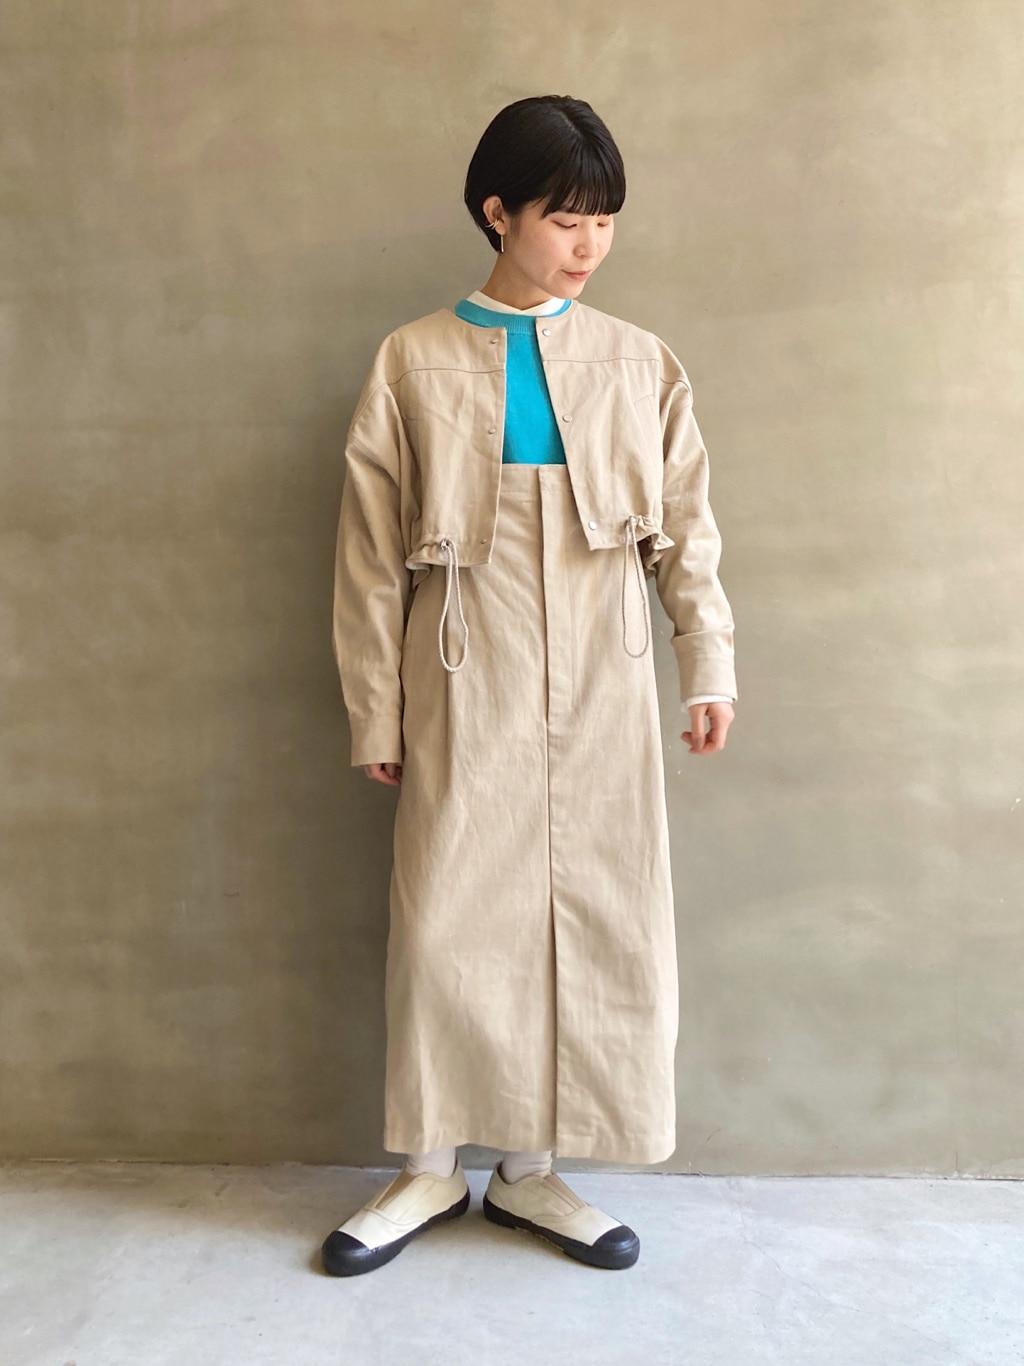 caph troupe 福岡薬院路面 身長:156cm 2021.02.12